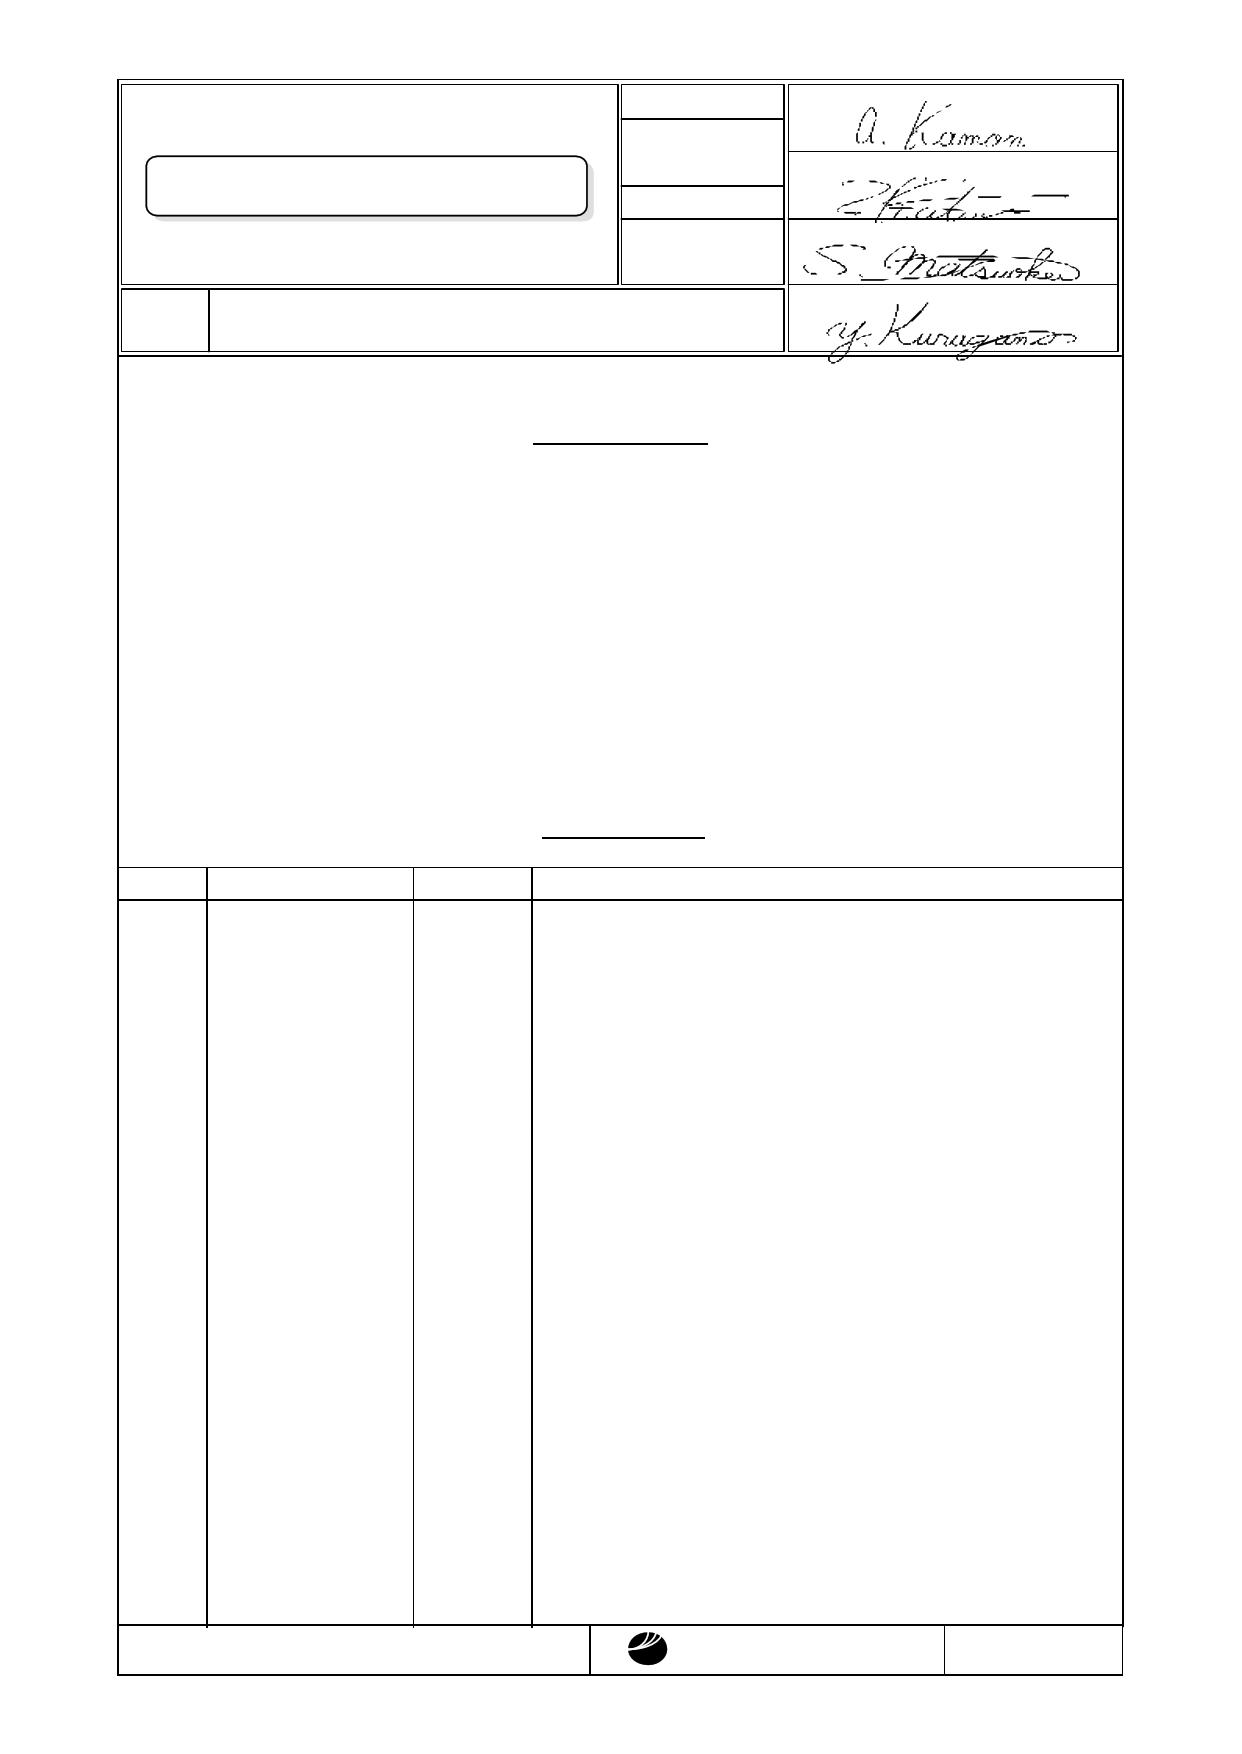 F-51159NYJ-SEW-AA datasheet